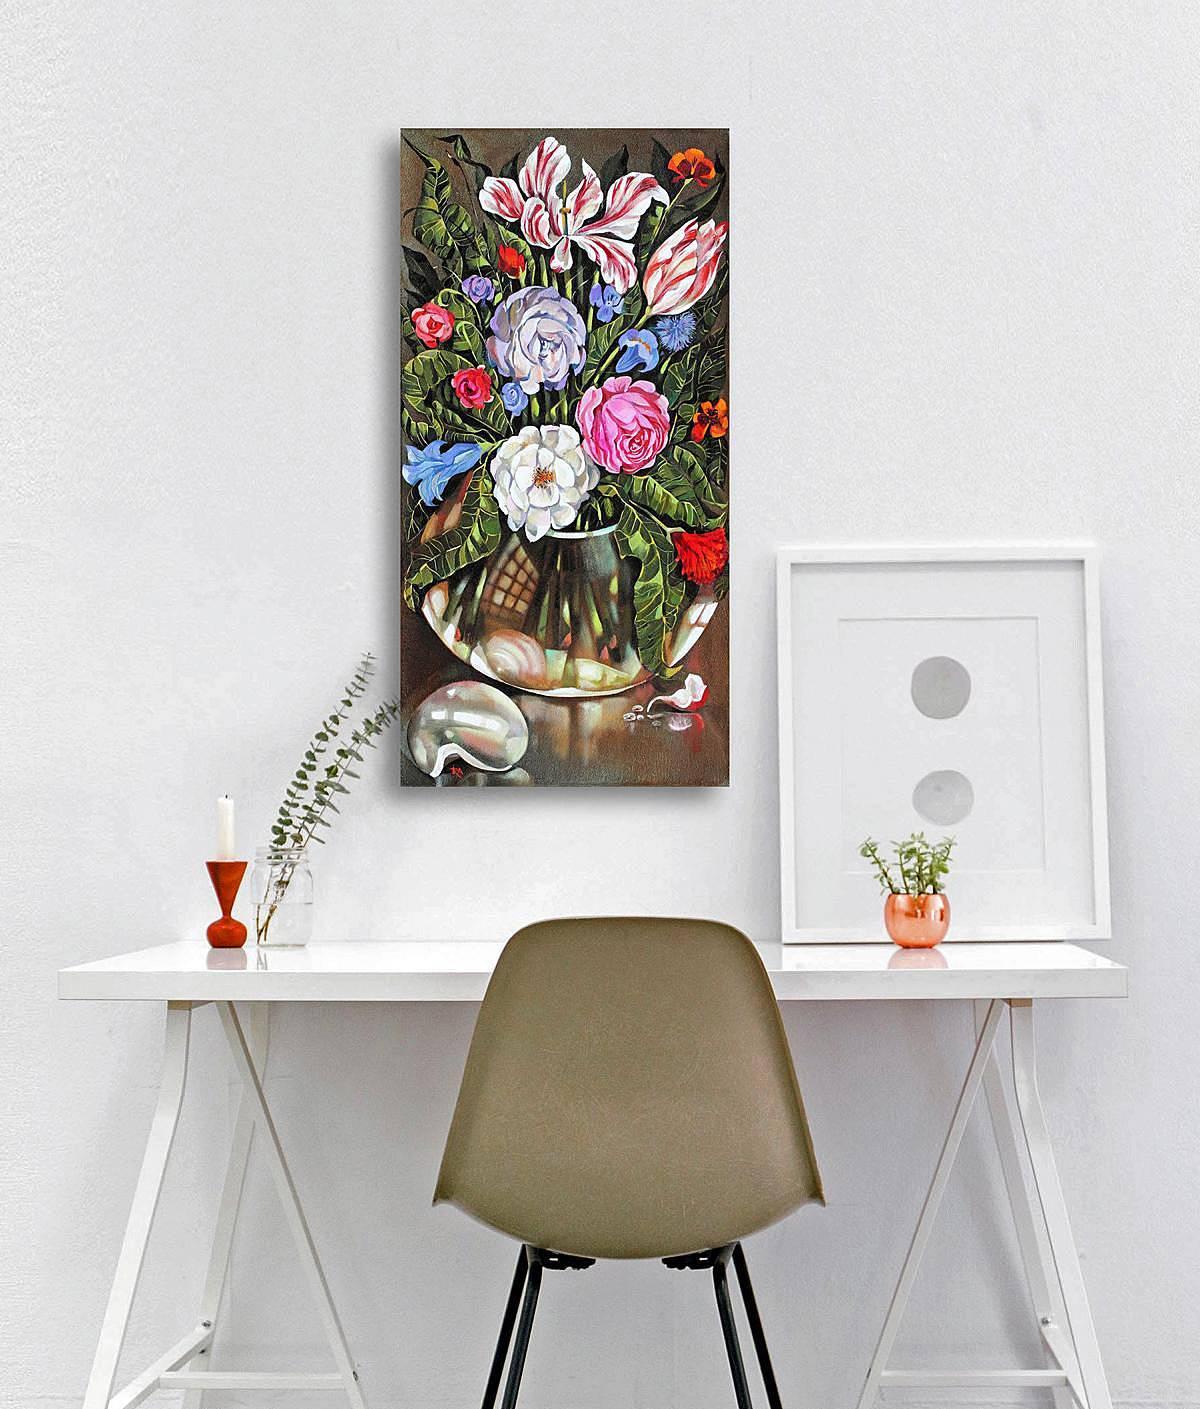 SERIES ART DECO, Flowers for Lempicka